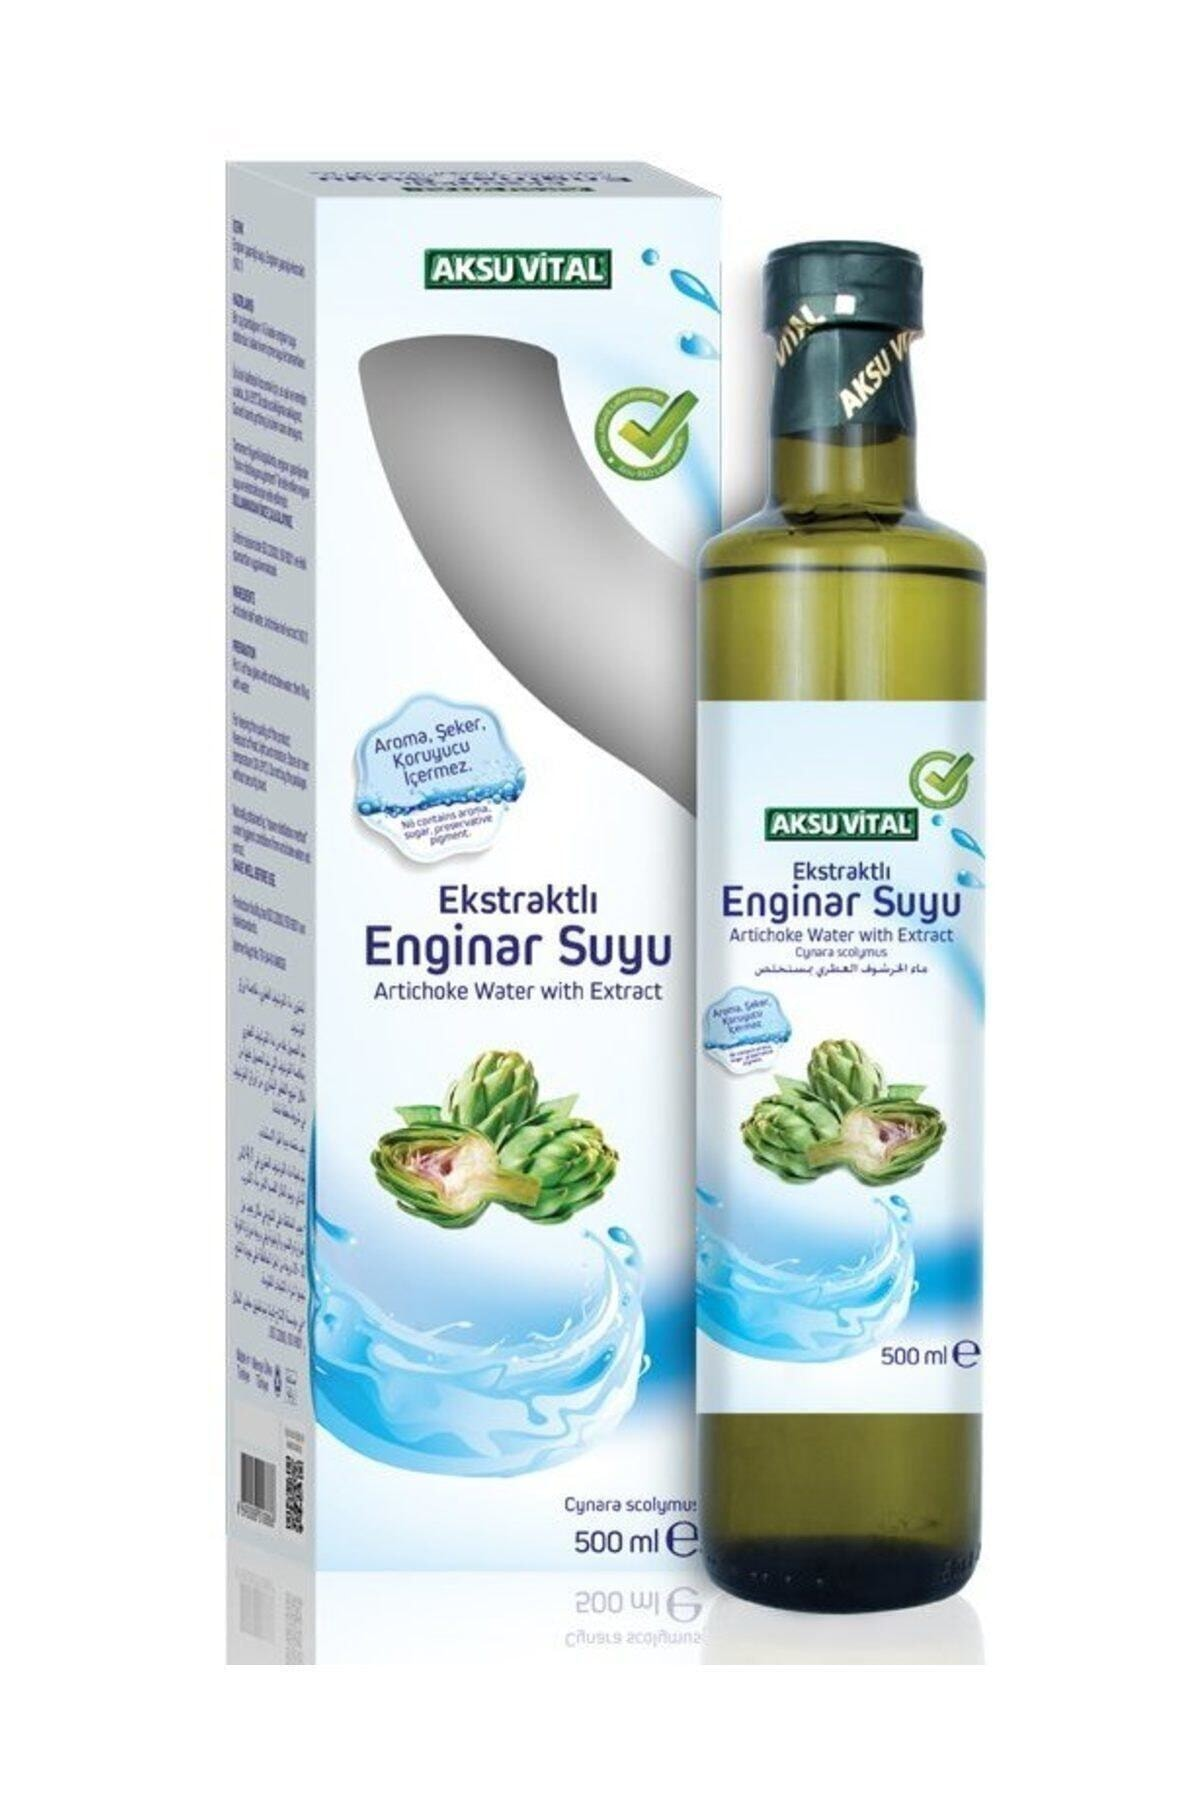 Aksu Vital Ekstraktlı Enginar Suyu 500 ml 1